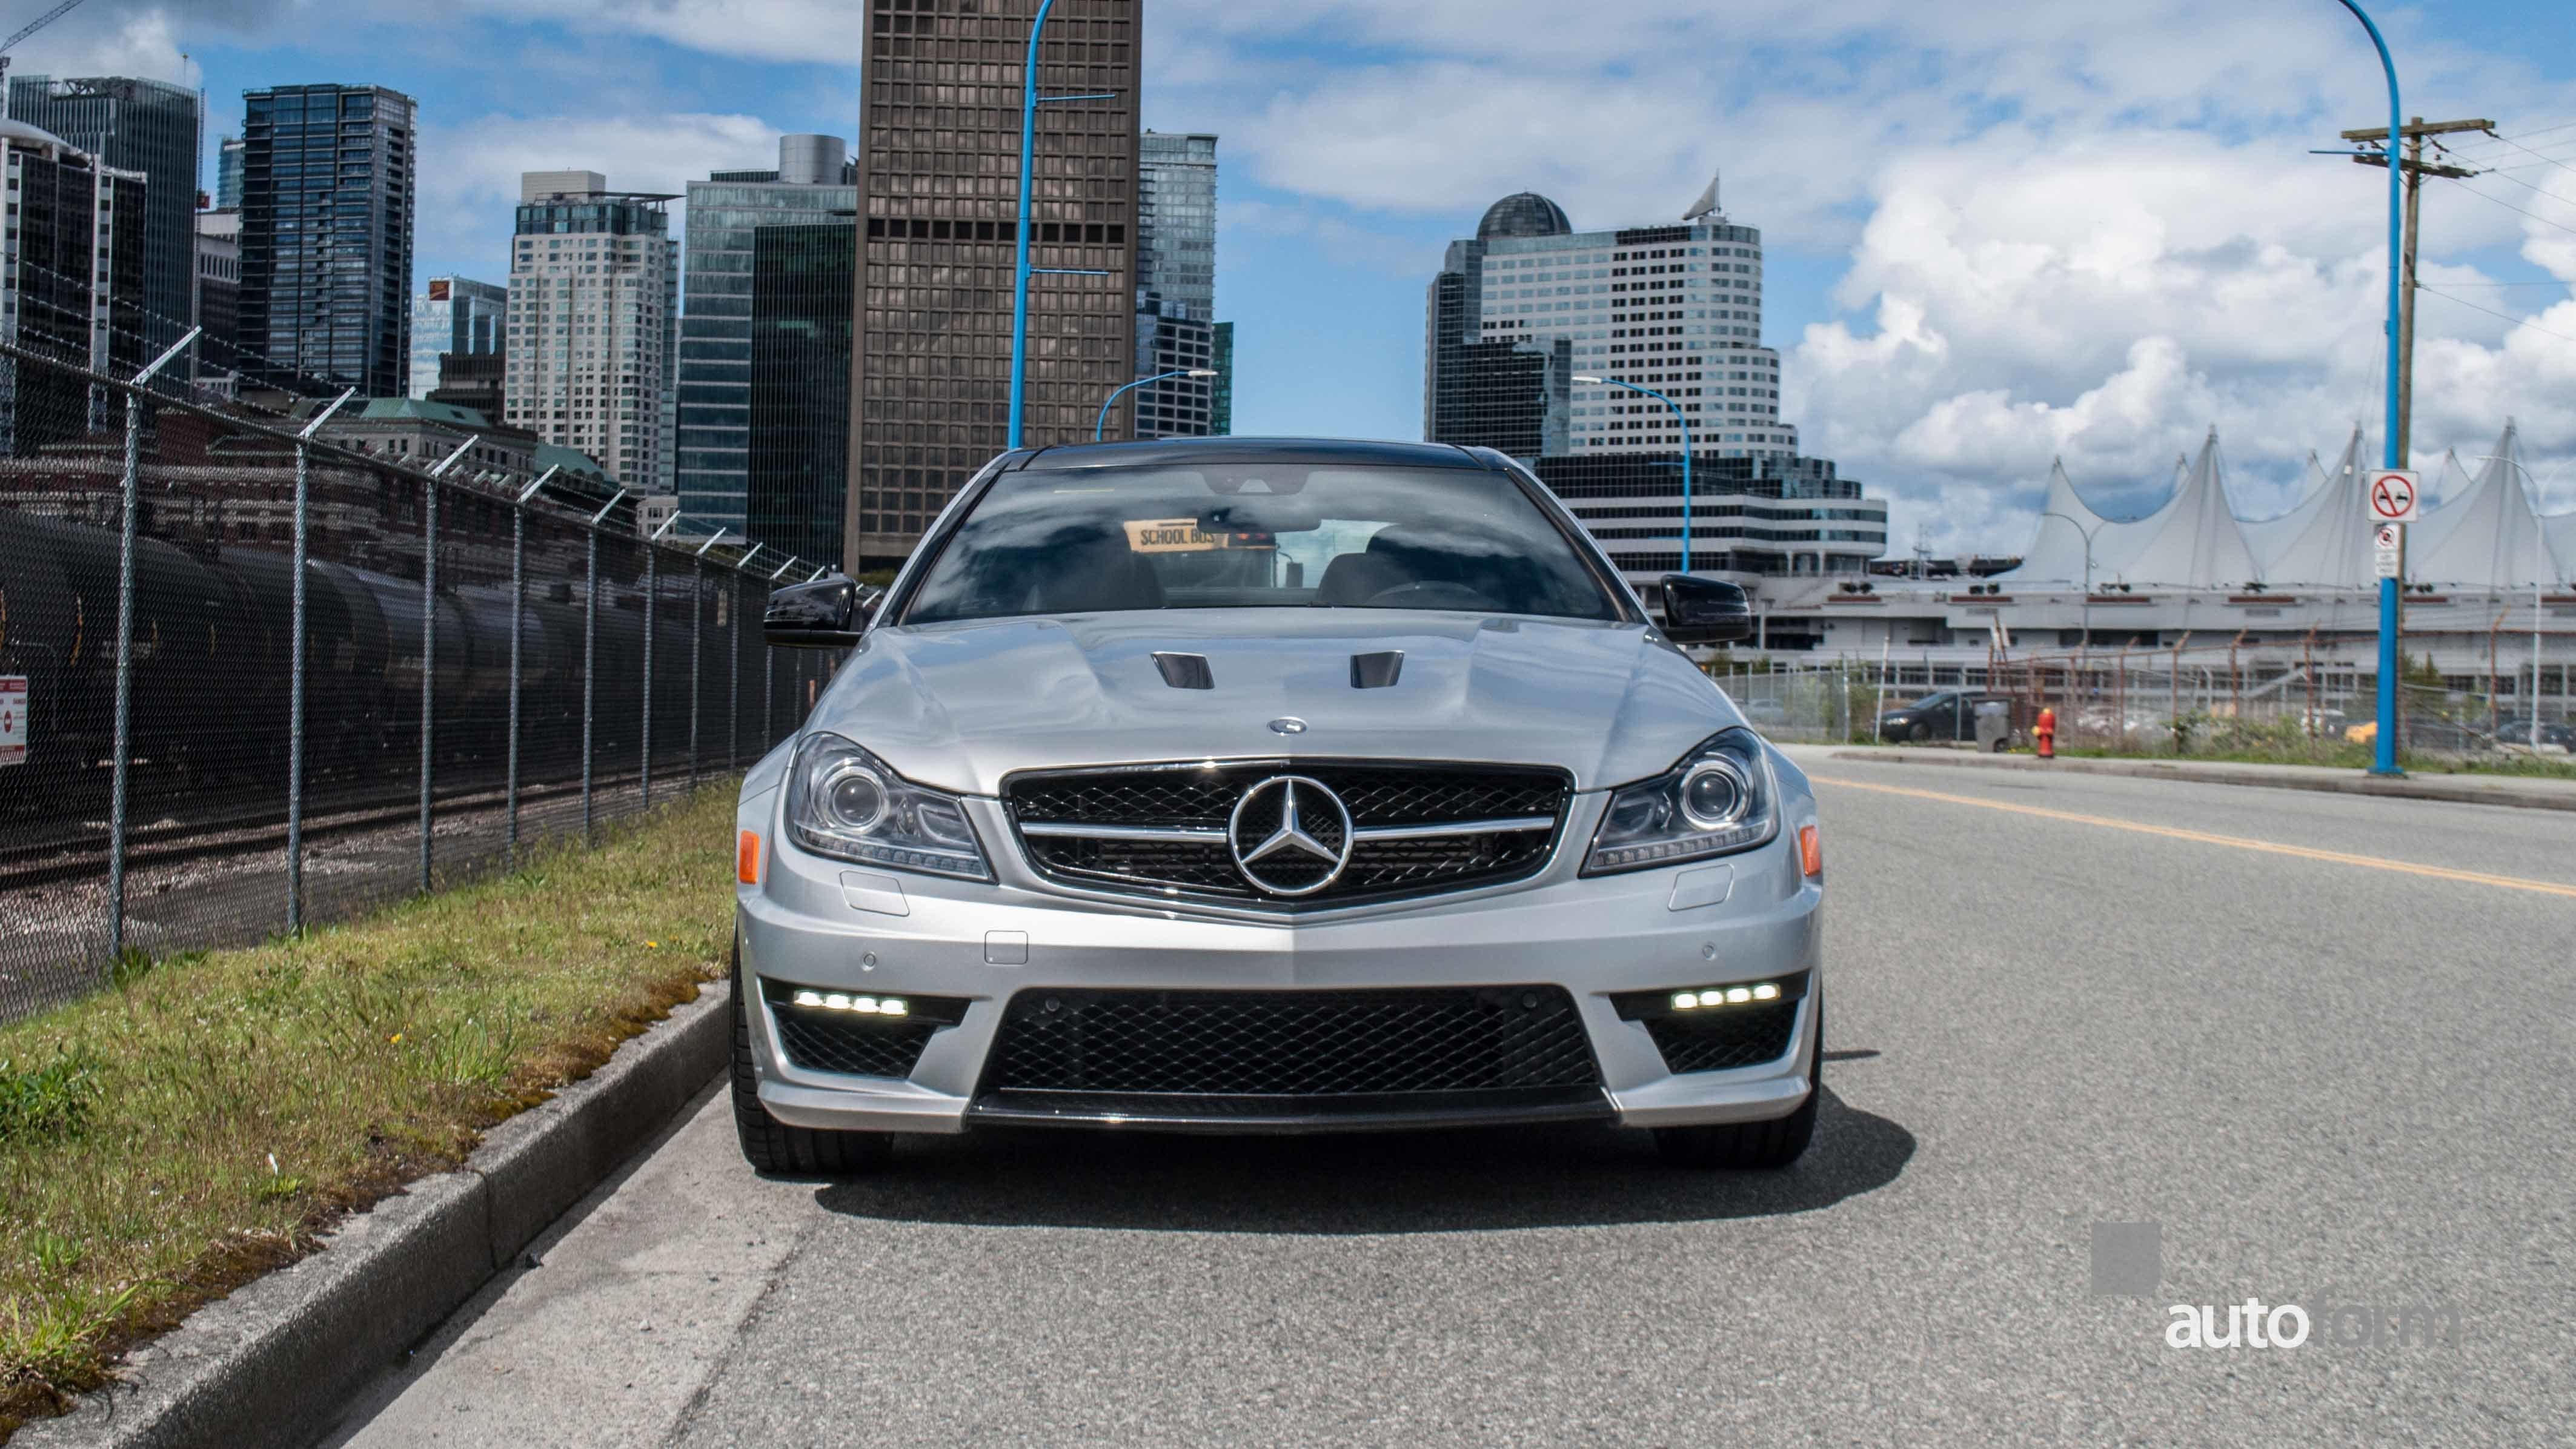 2014 mercedes benz c63 amg 507 edition autoform for Mercedes benz vancouver